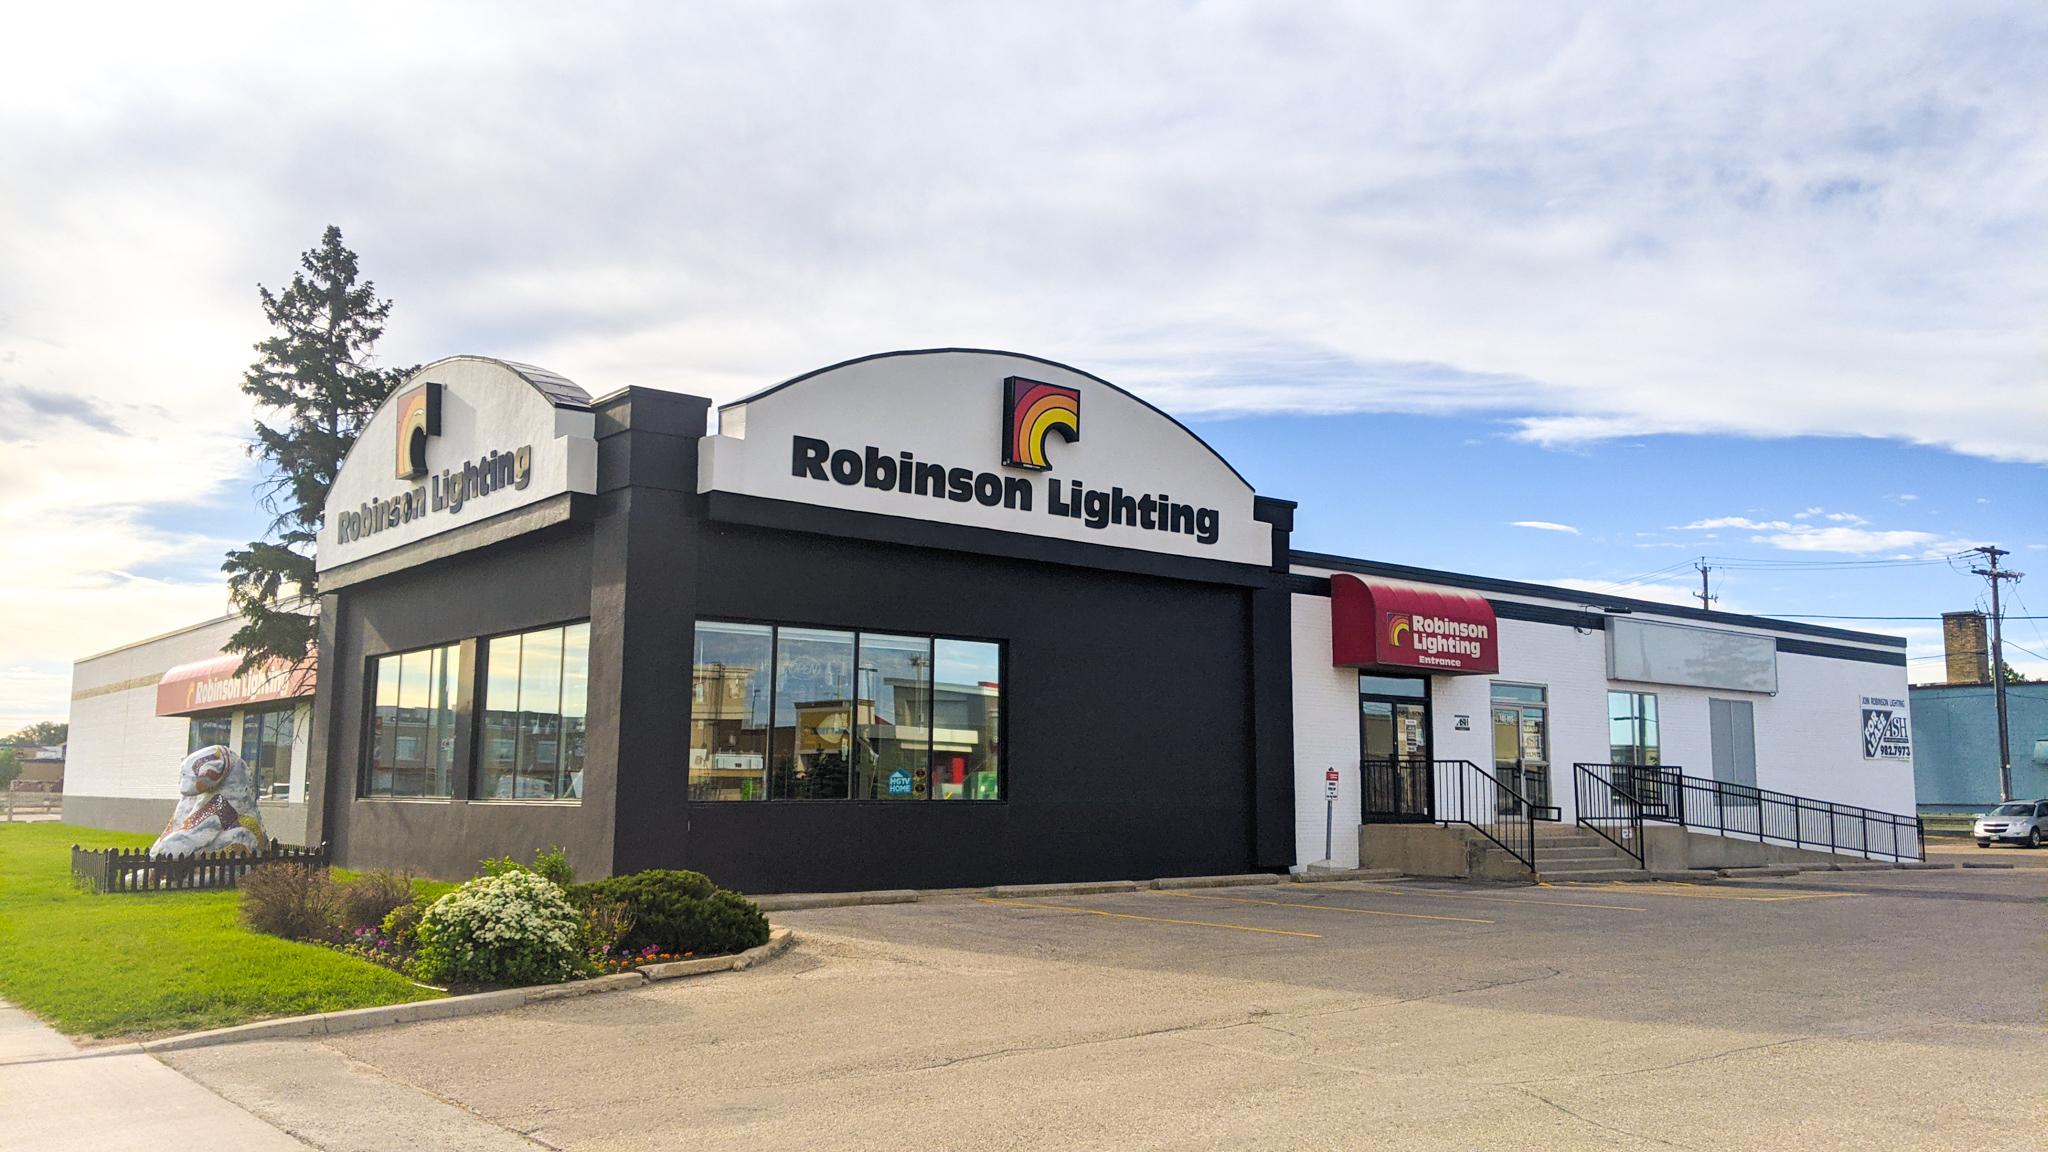 Robinson Lighting Centre